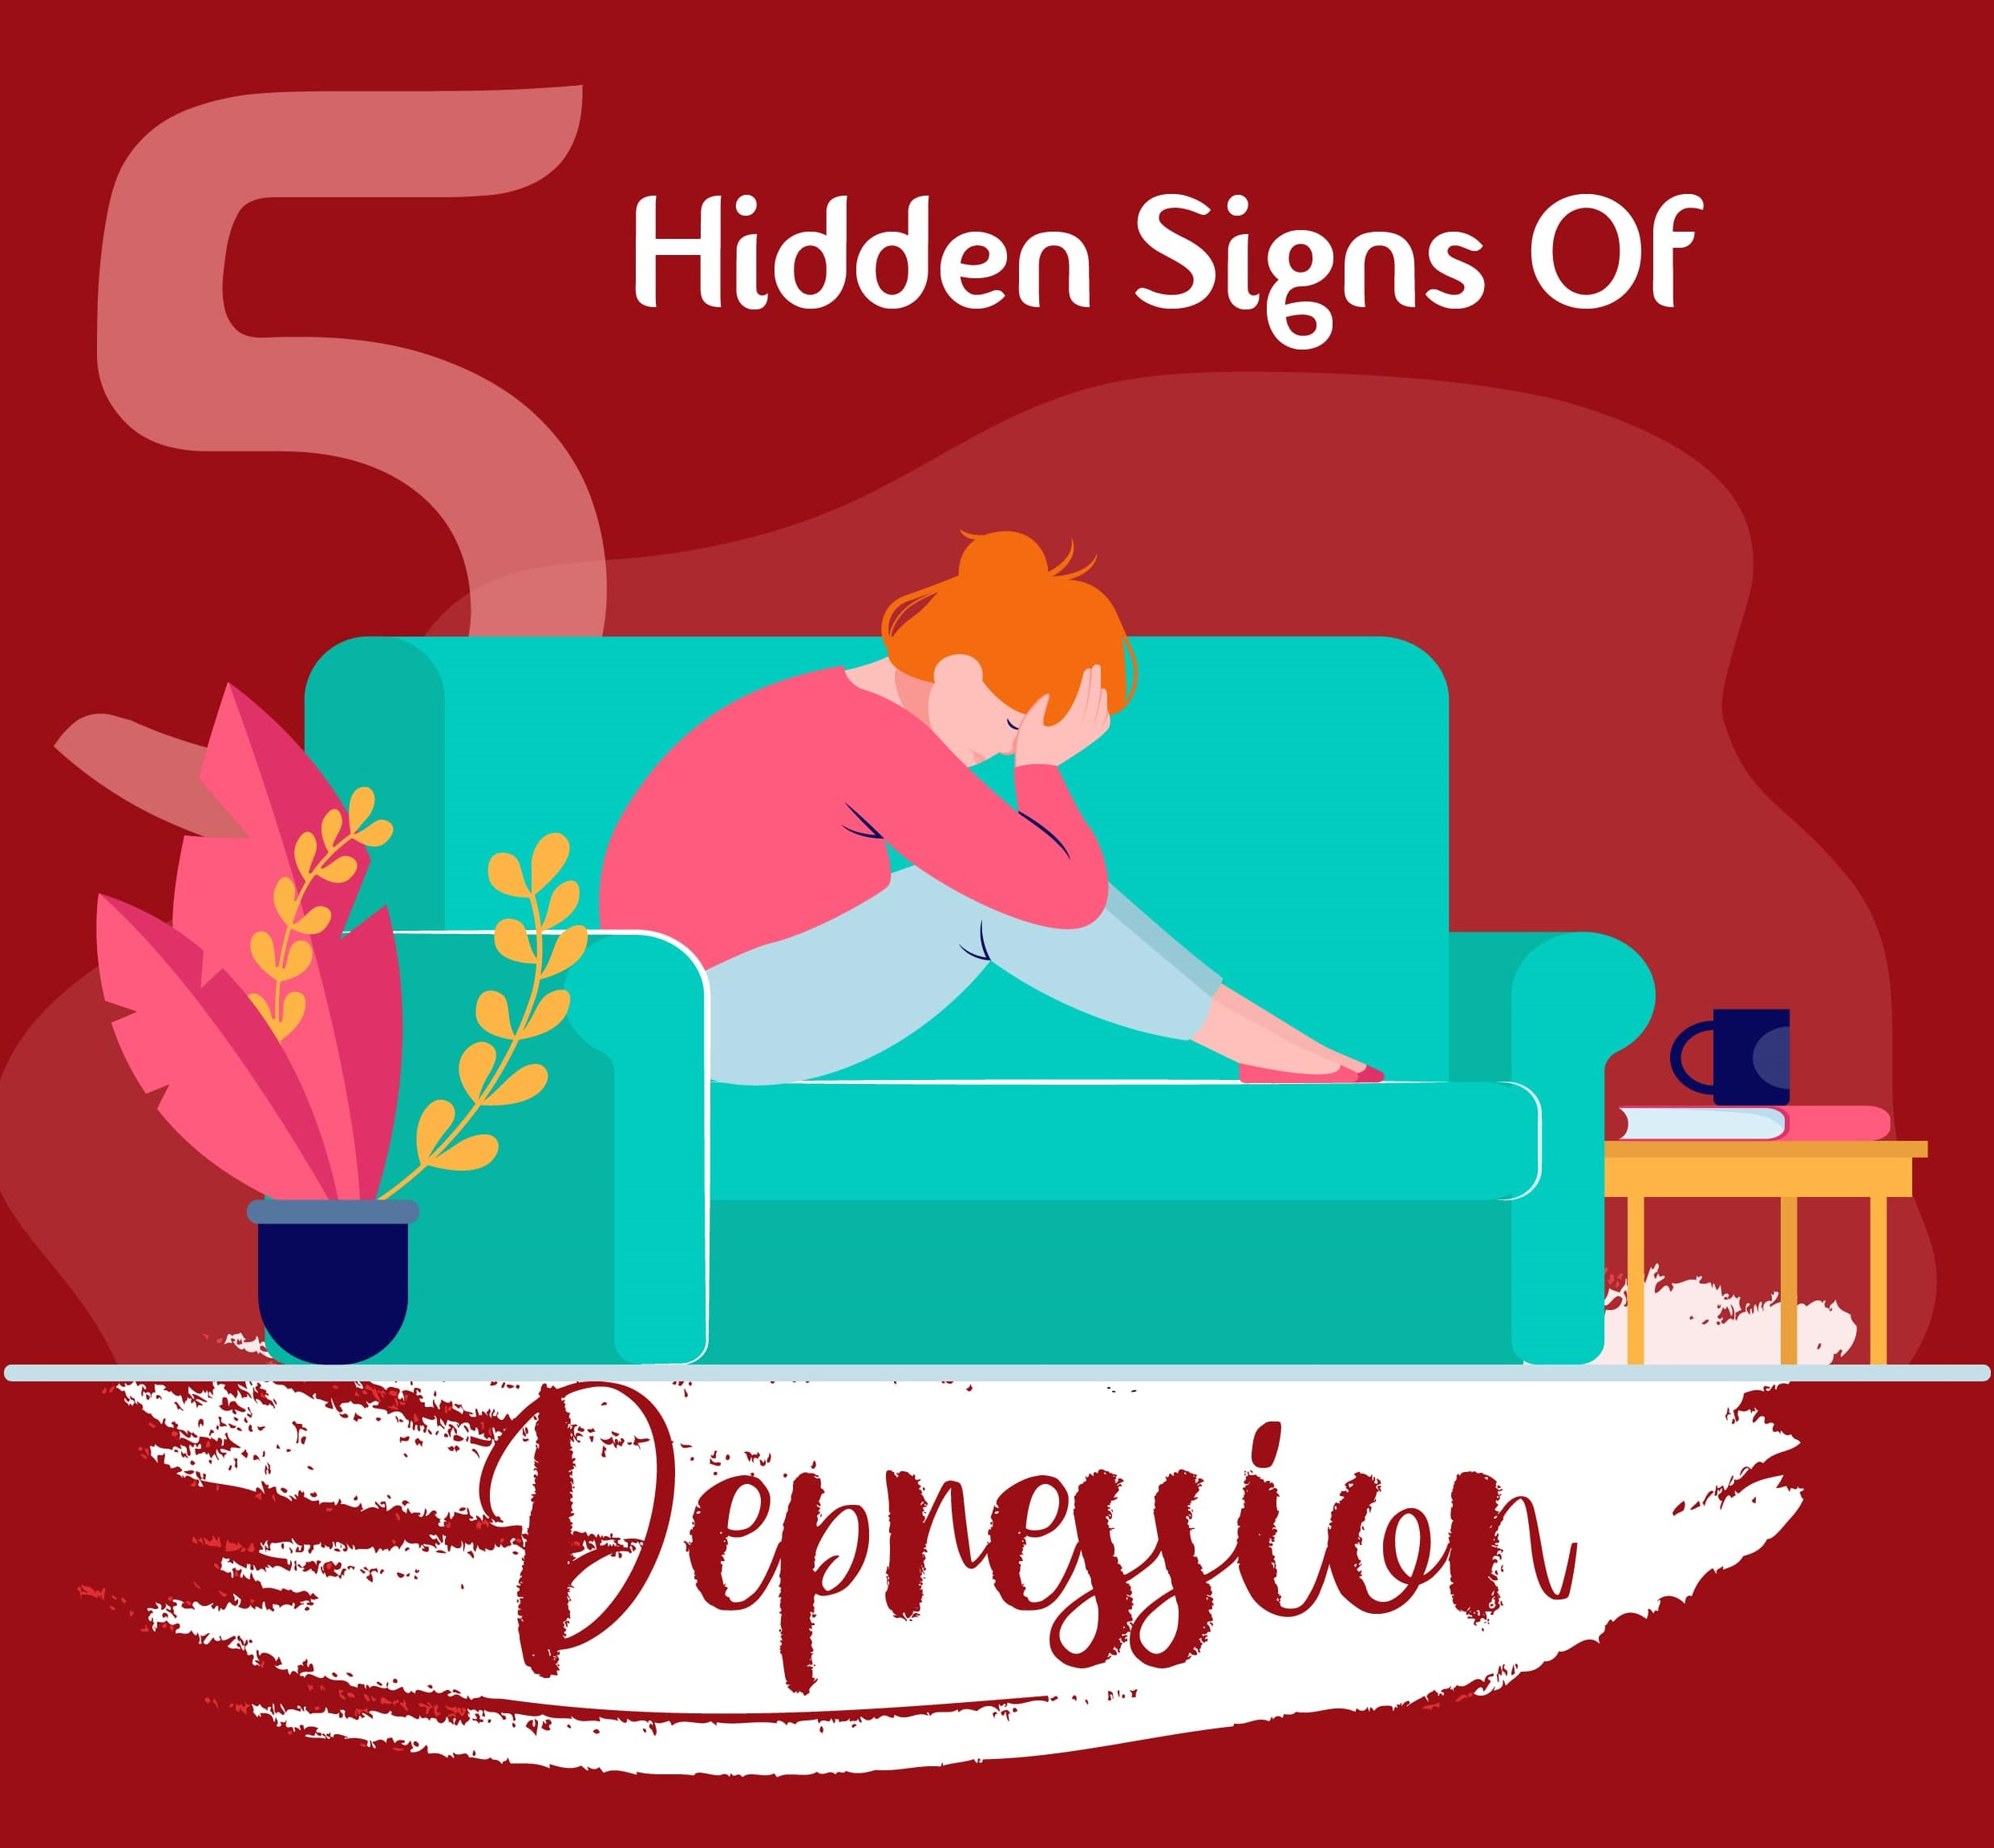 5 Hidden Signs of Depression